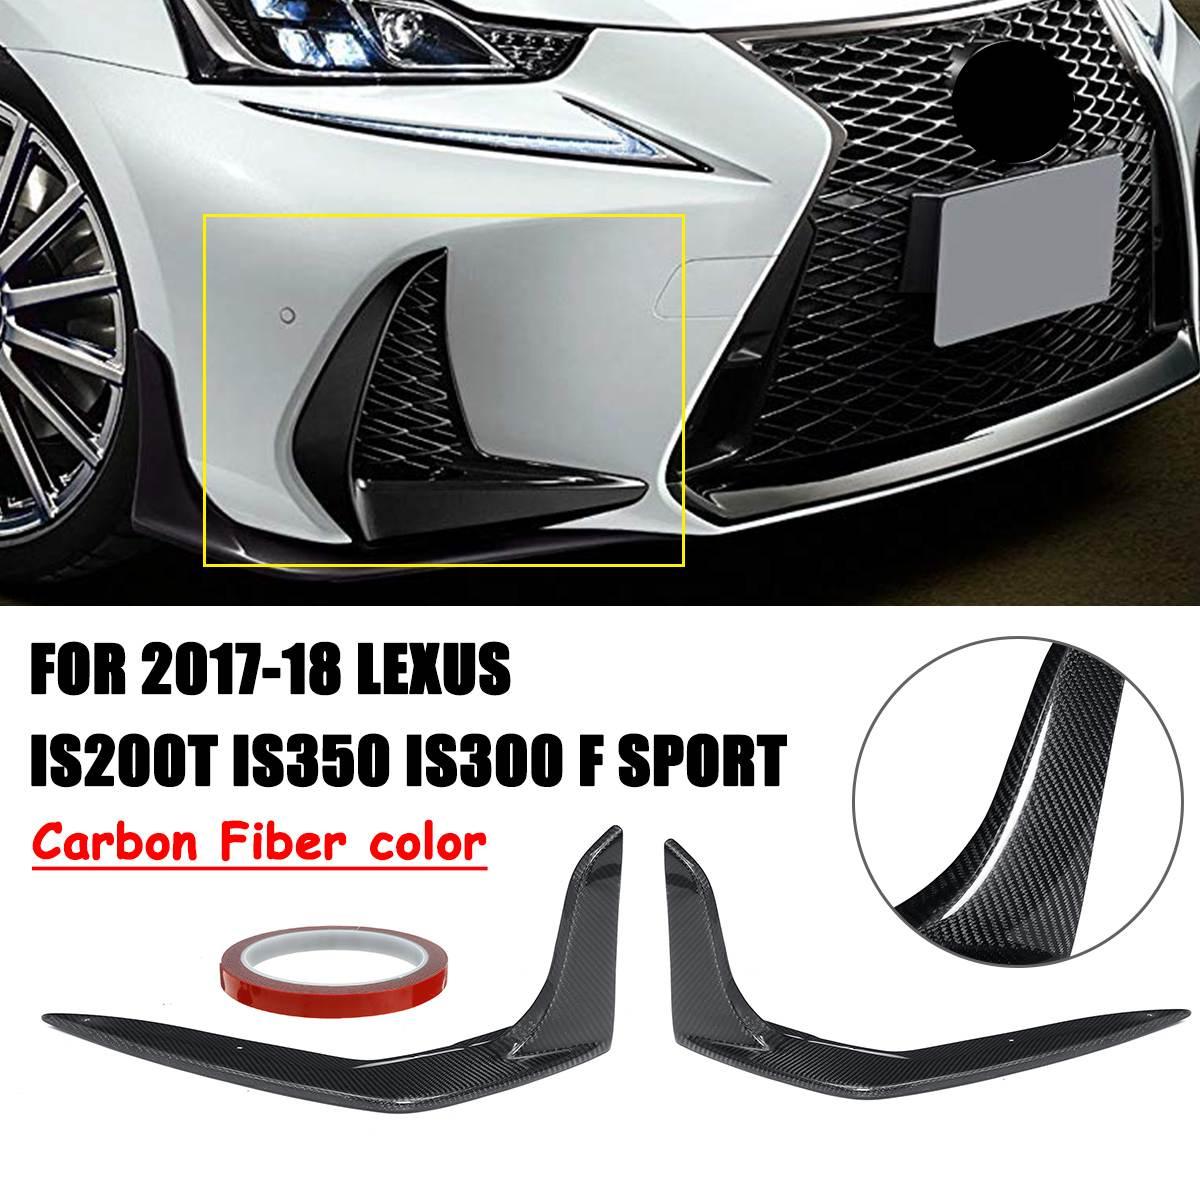 Разделители переднего бампера для LEXUS IS200T IS350 IS300 F Sport 2017 2018, 1 пара